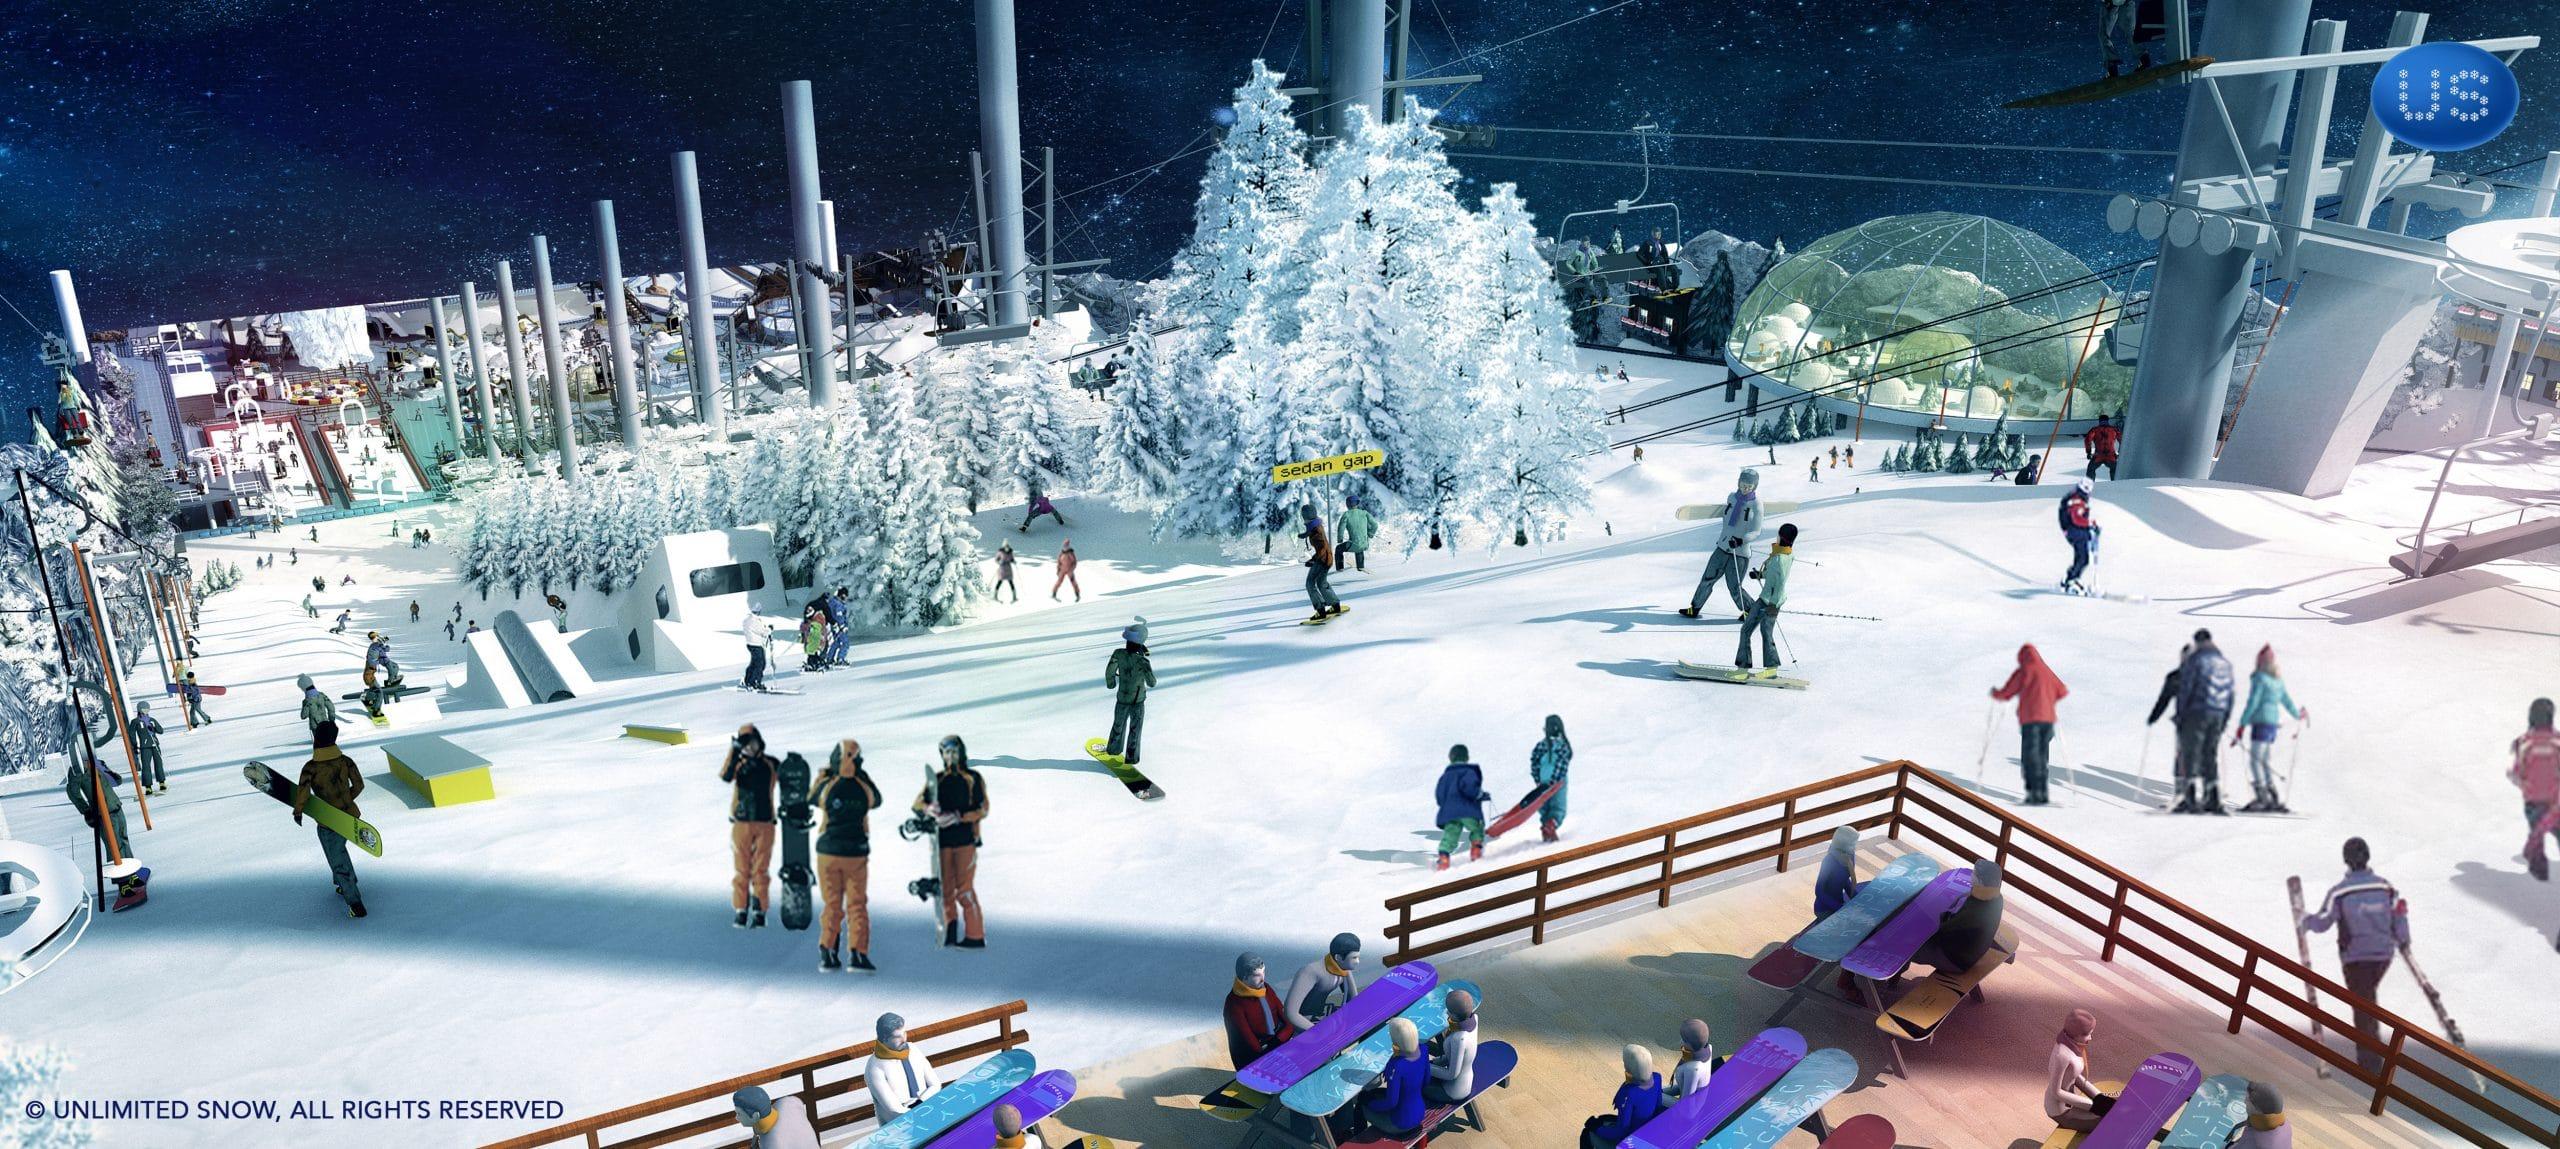 https://www.giebrostechnics.nl/wp-content/uploads/2020/07/Unlimited-Snow_Photo_5-scaled.jpg